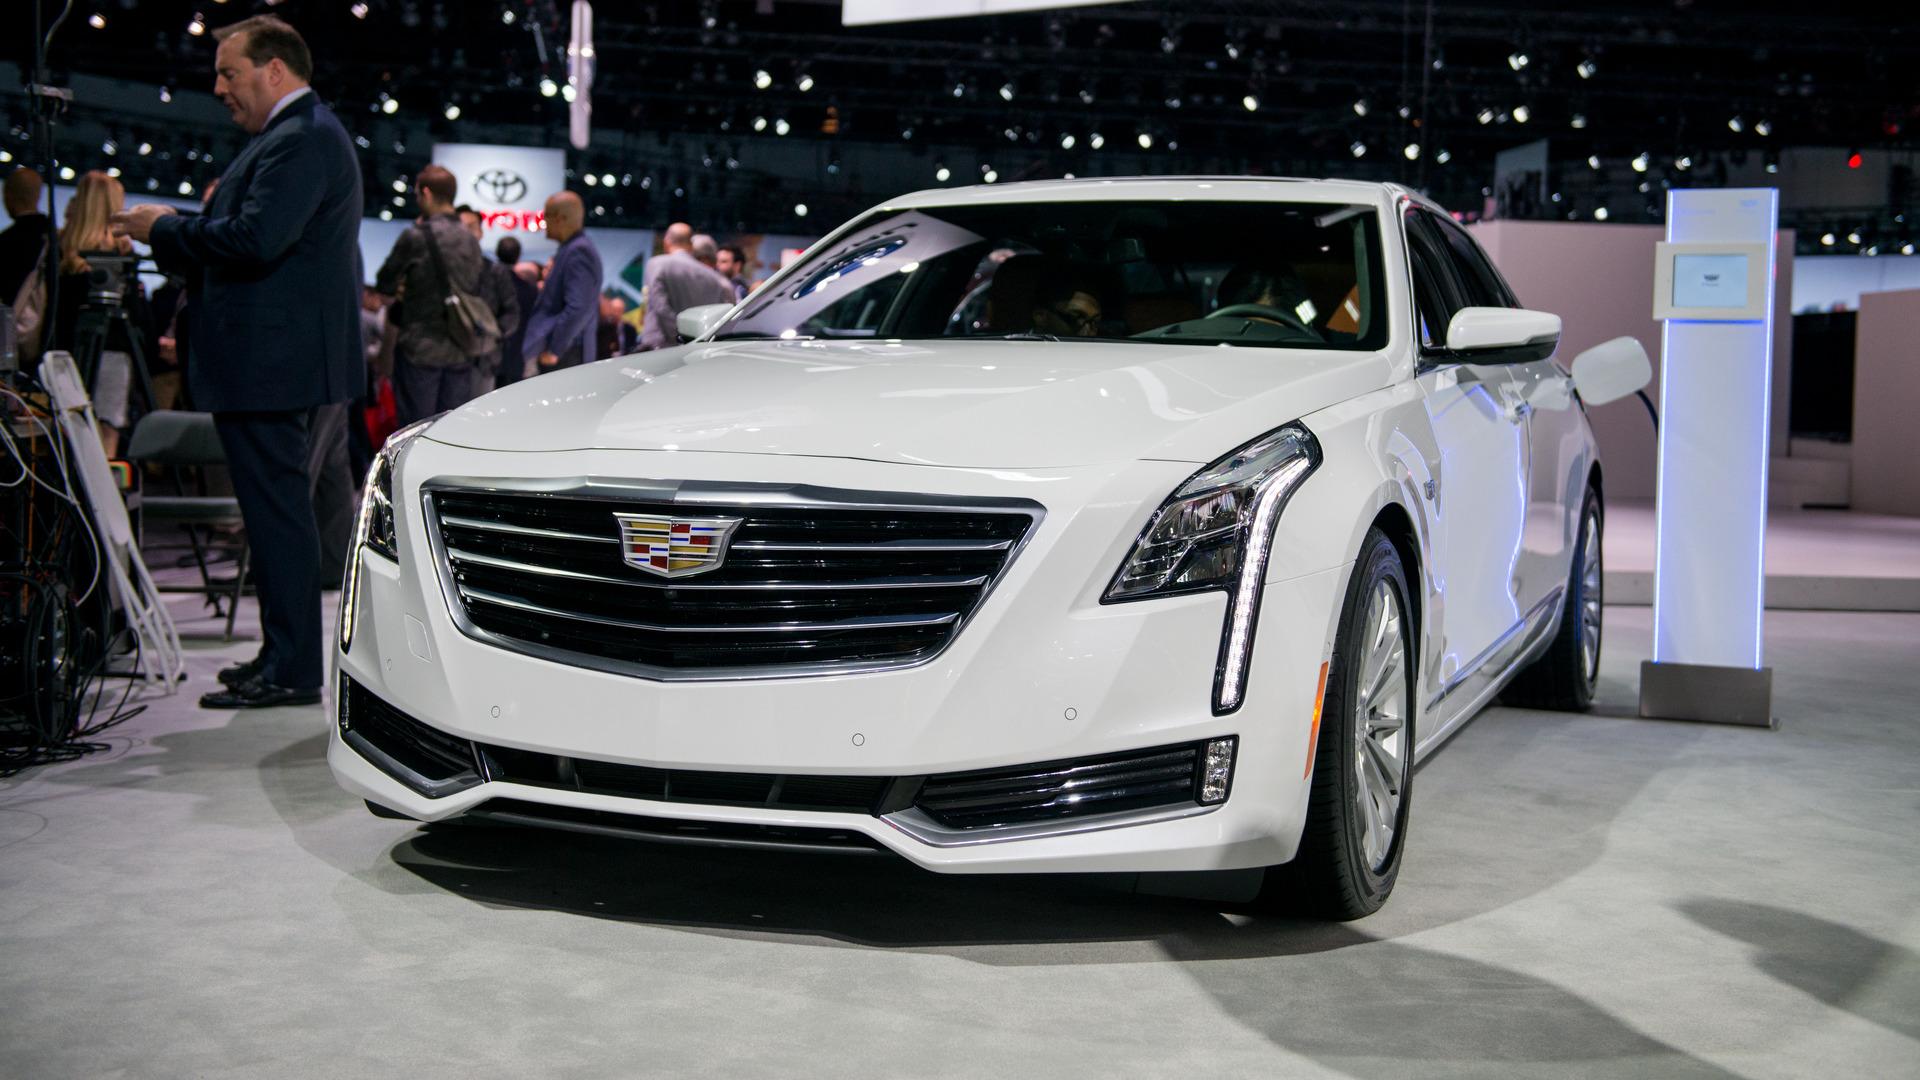 2017 Cadillac Ct6 2.0 L Turbo Luxury >> Los Angeles 2016 - La Cadillac CT6 passe à l'hybride